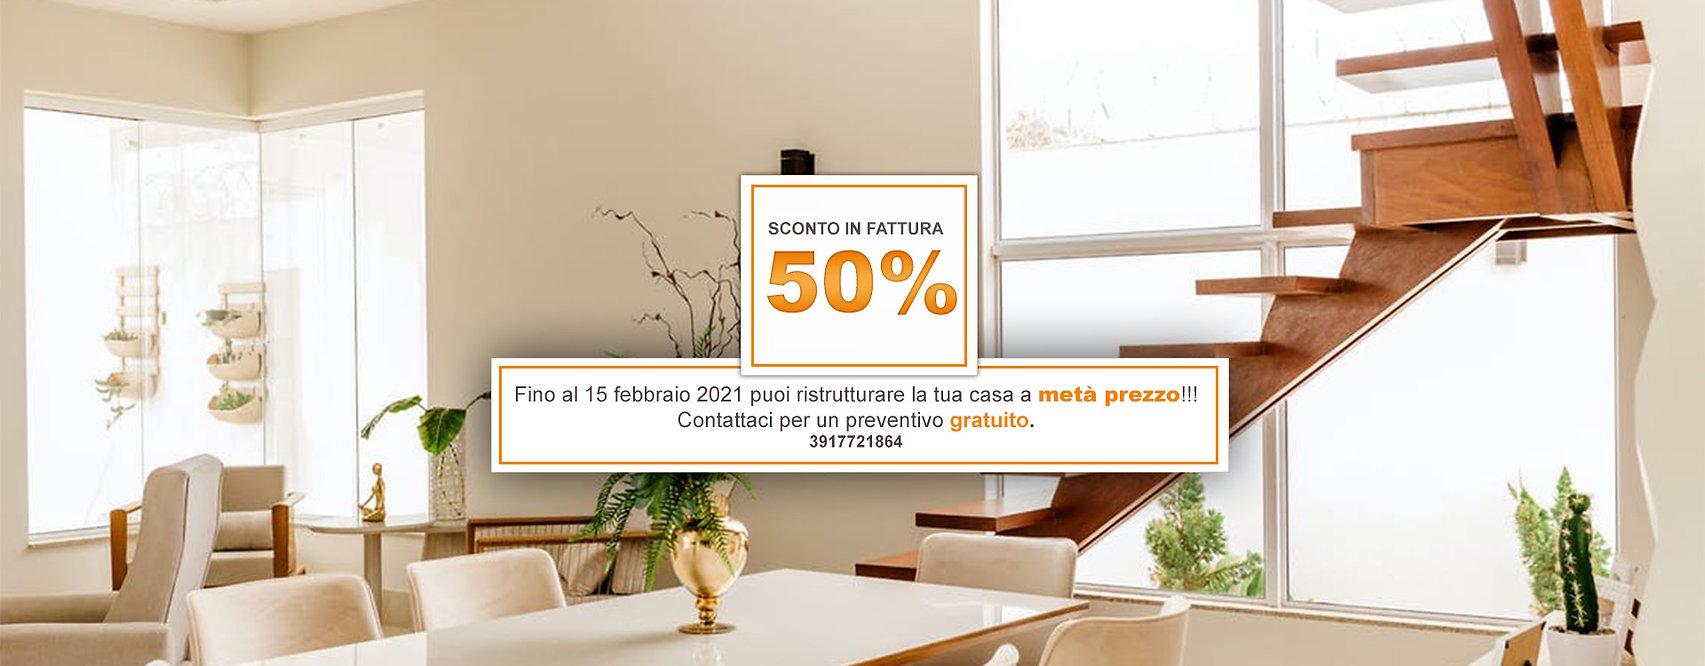 copertina zeromas design sito sconto 50%